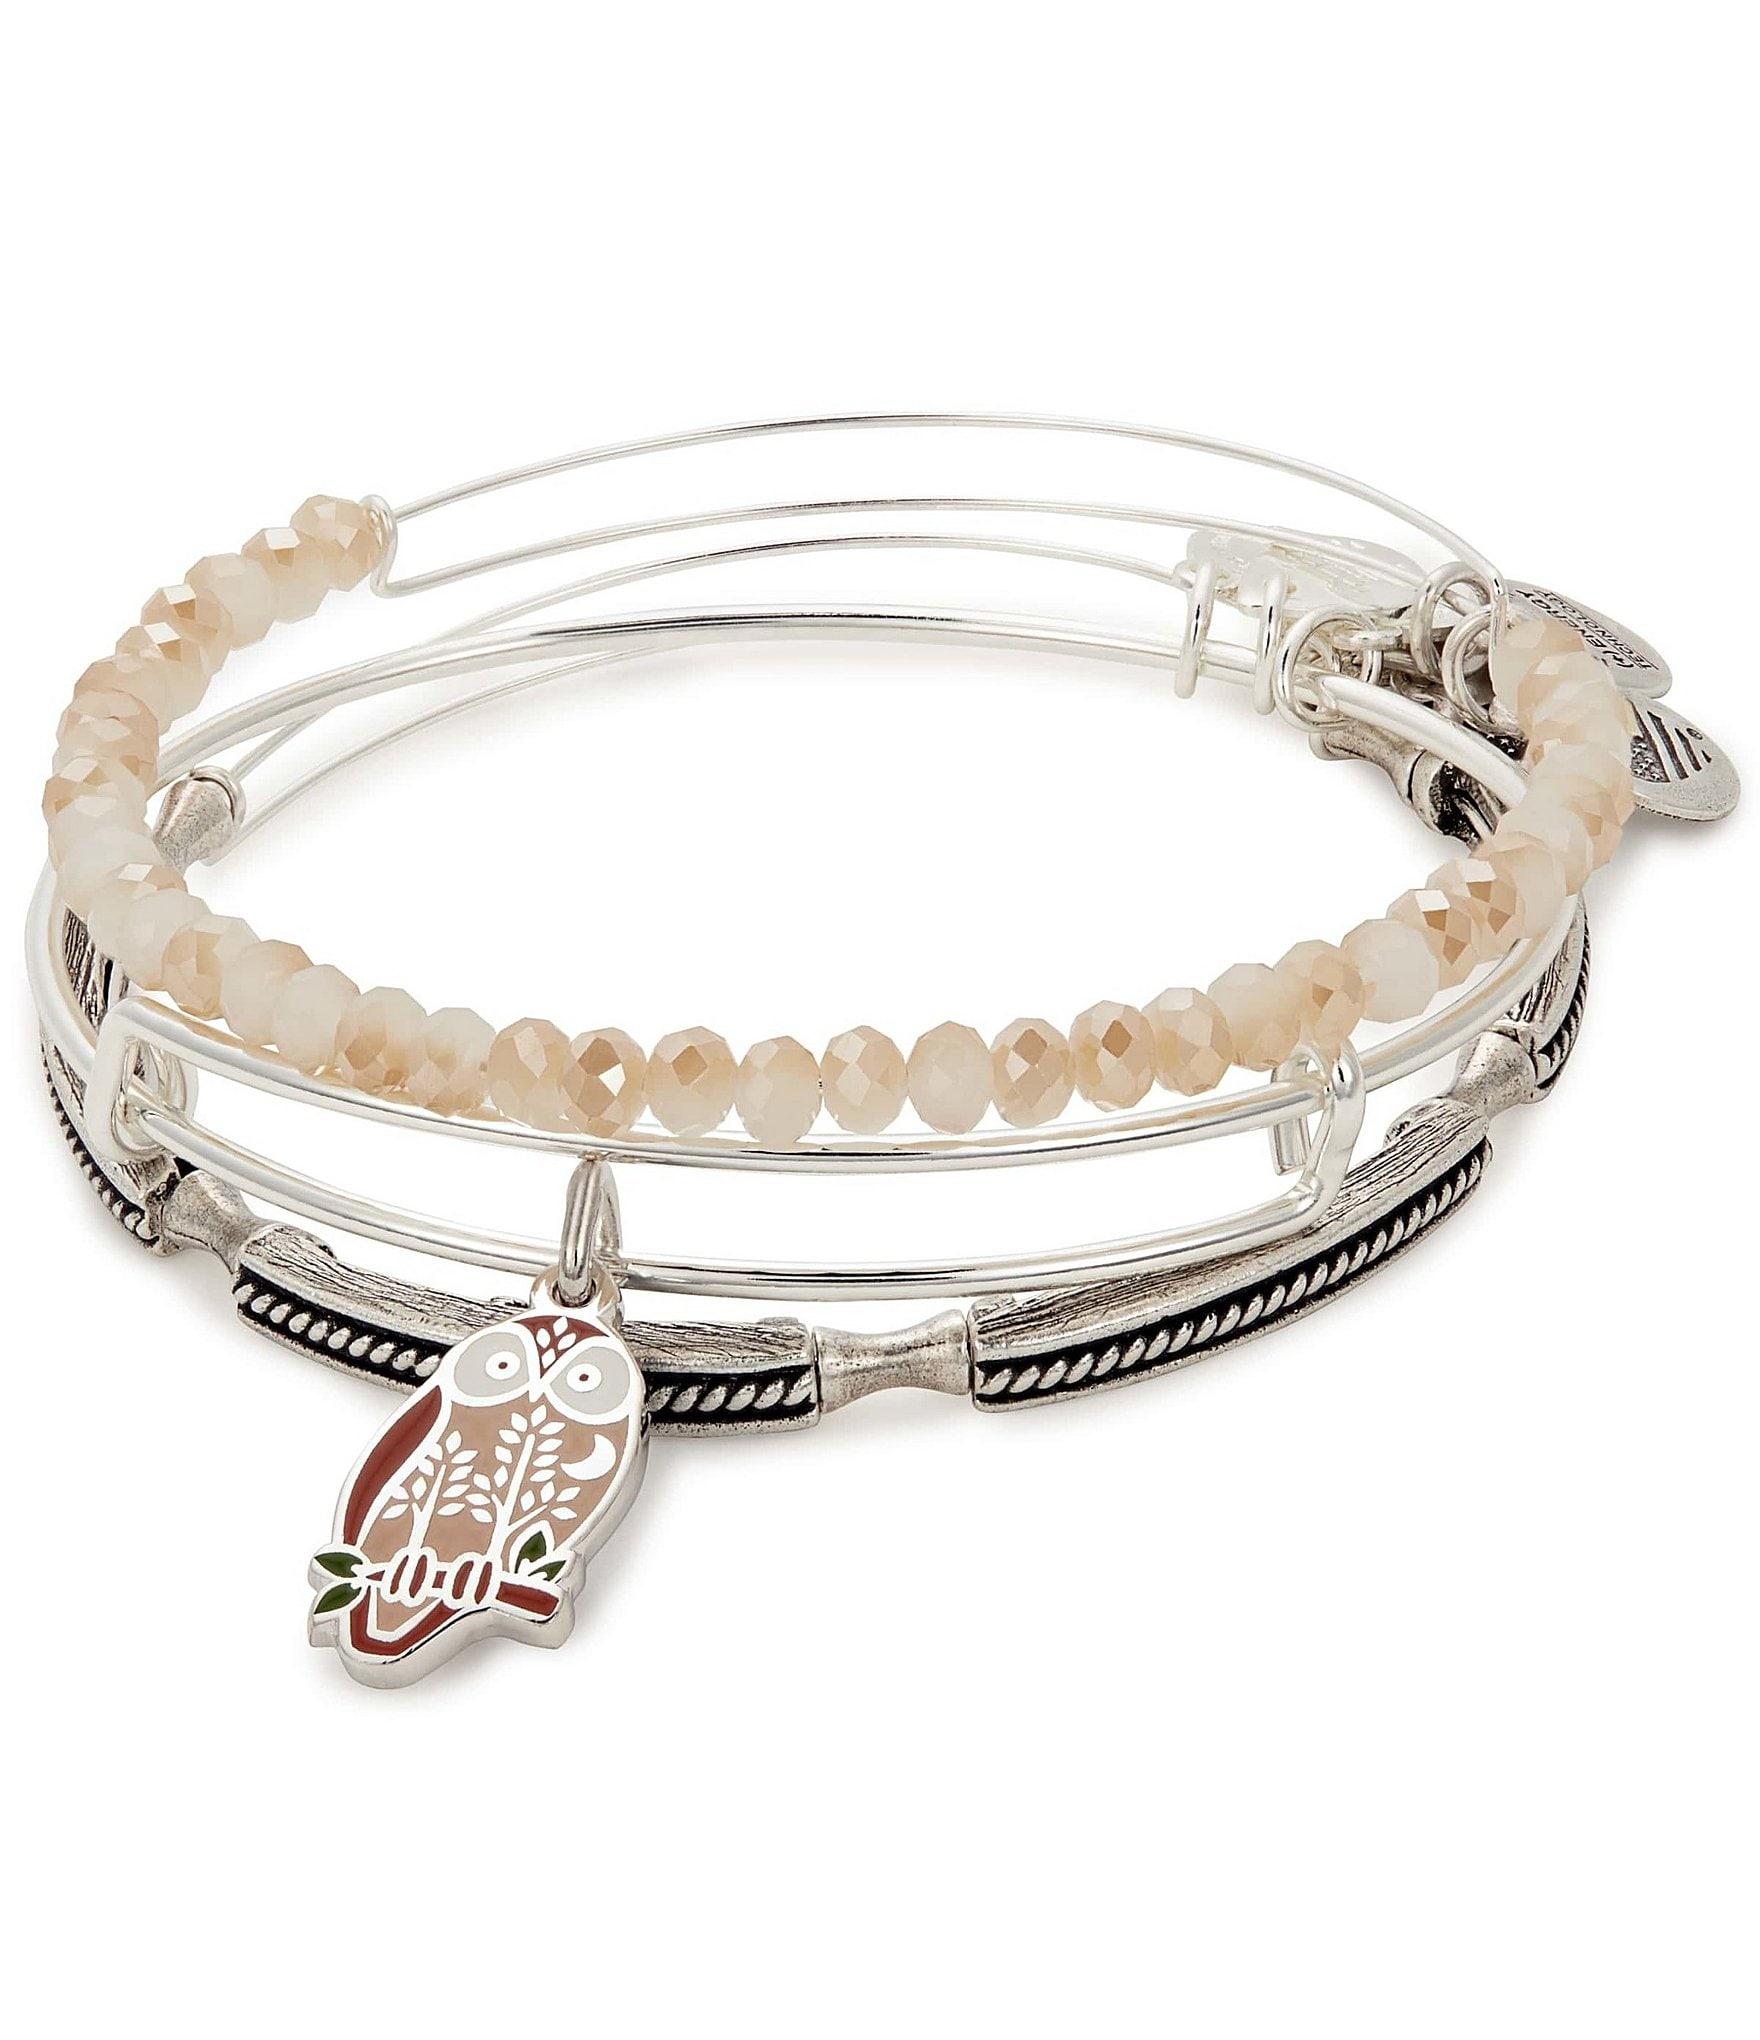 Pandora bracelet dillards - Pandora Bracelet Dillards 57